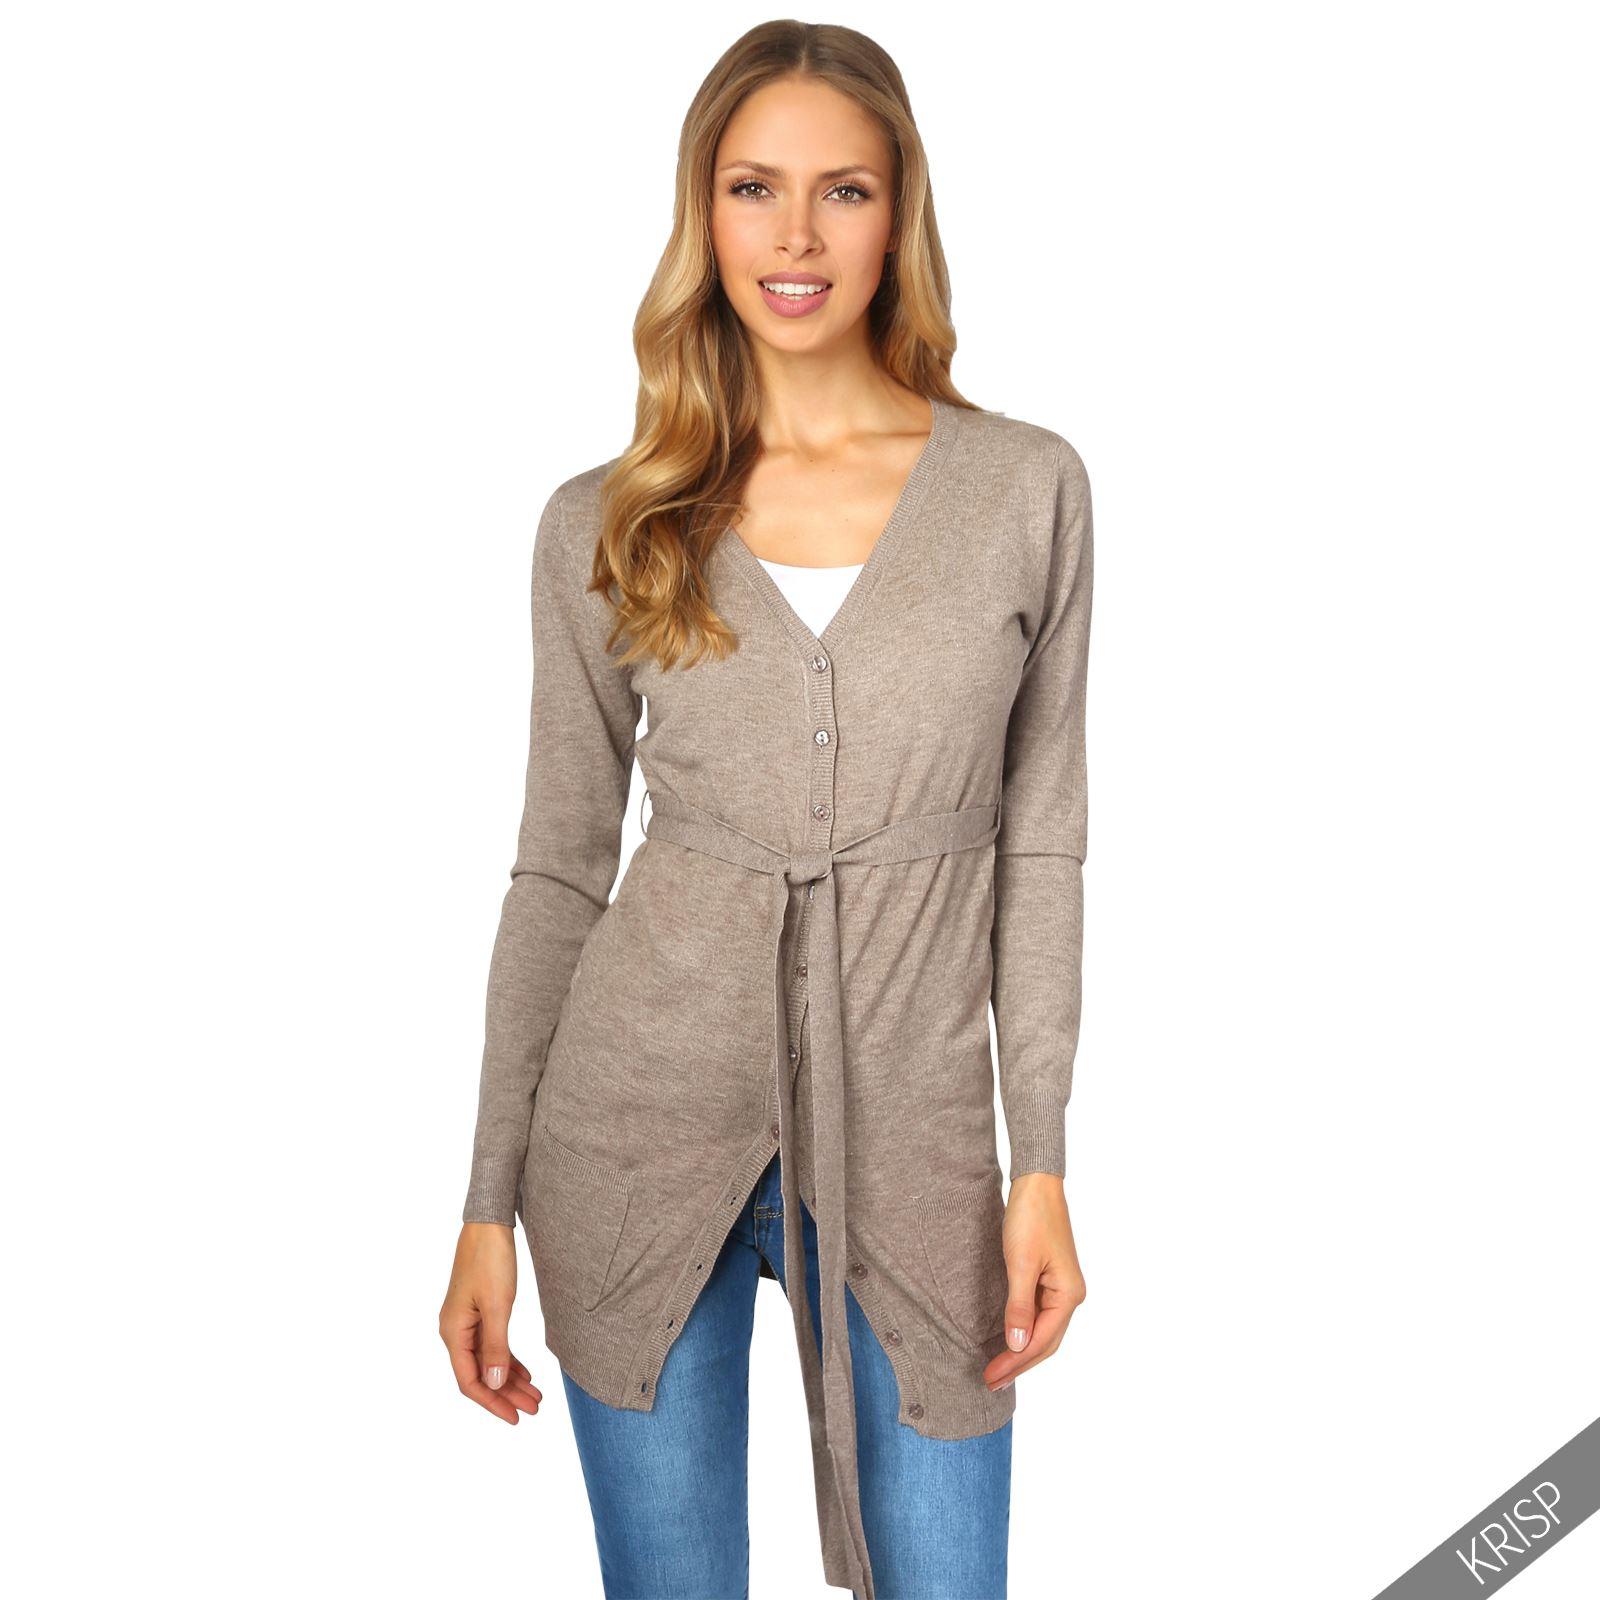 femmes cardigan gilet coatigan pull poches ceinture long veste cachemire tricot ebay. Black Bedroom Furniture Sets. Home Design Ideas